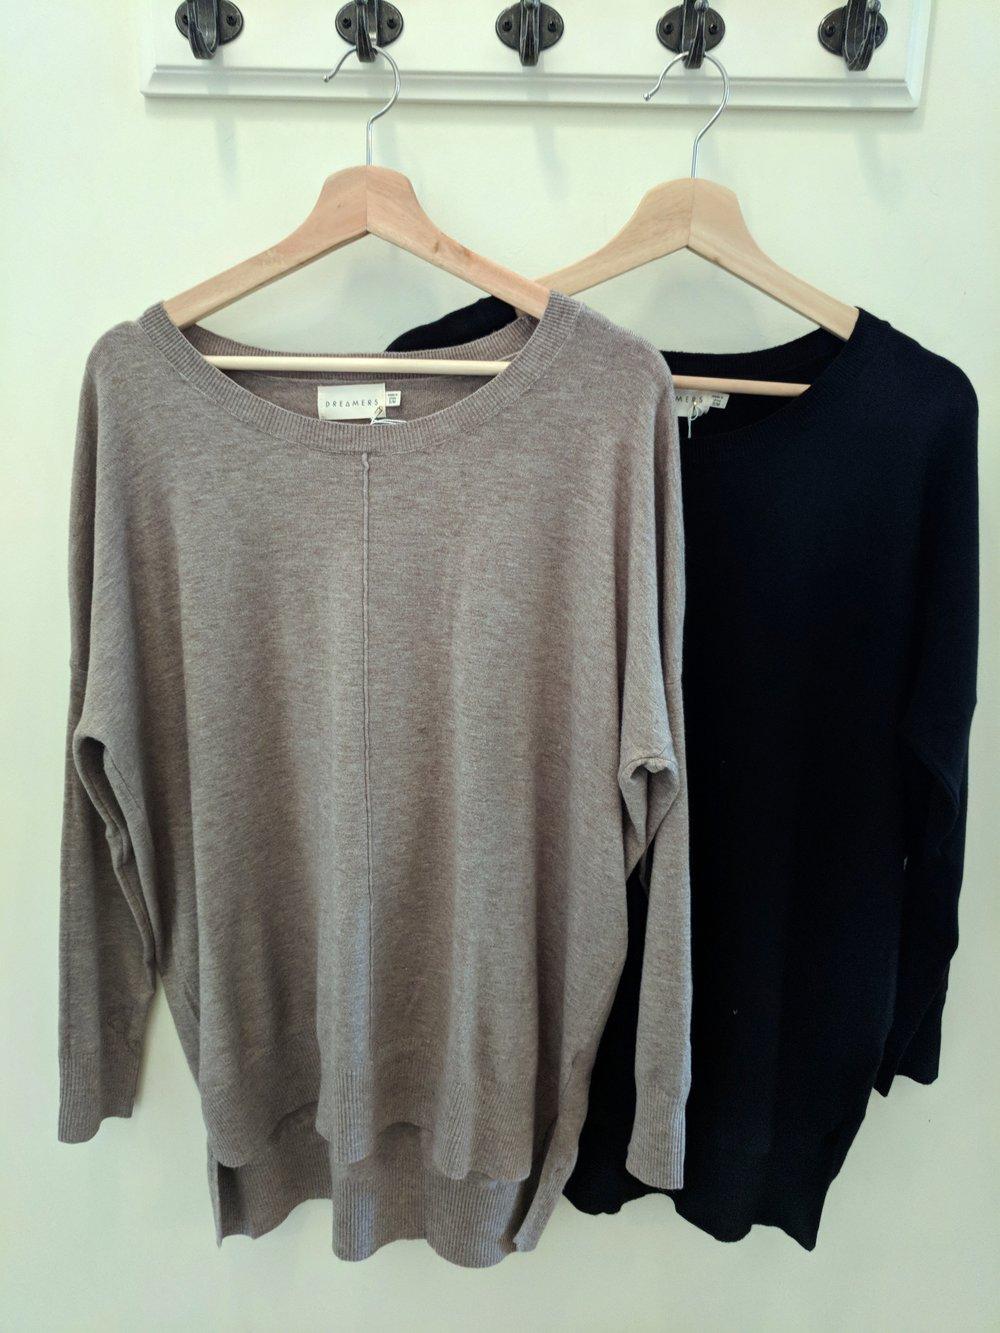 Black and Mocha Dreamer Sweater $42